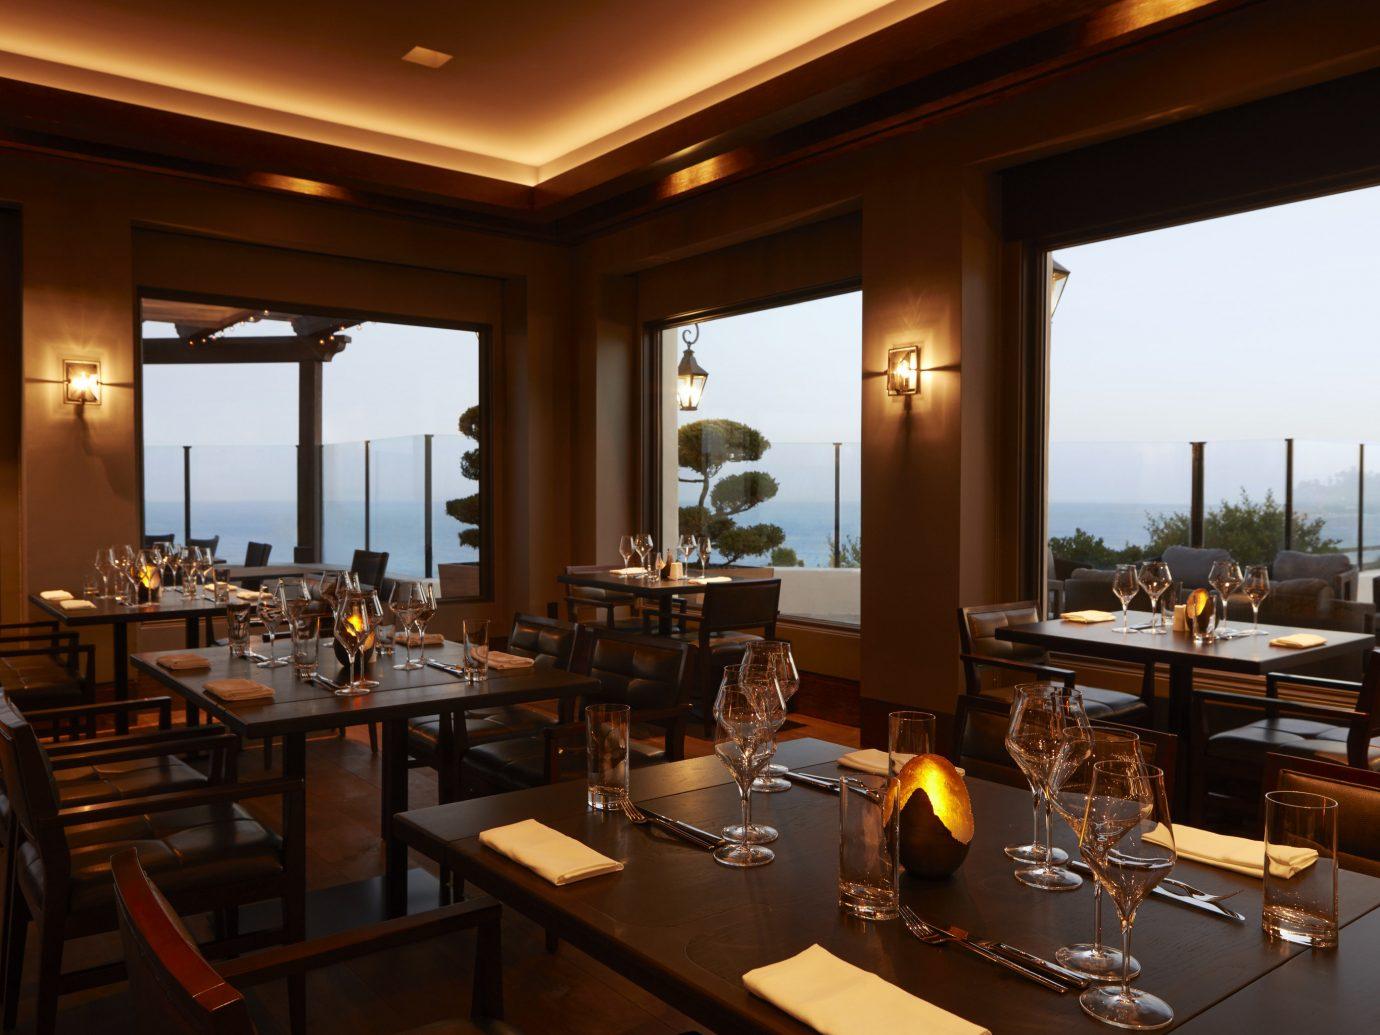 Hotels table window indoor ceiling restaurant room property meal interior design estate café Resort Bar dining room function hall Island furniture